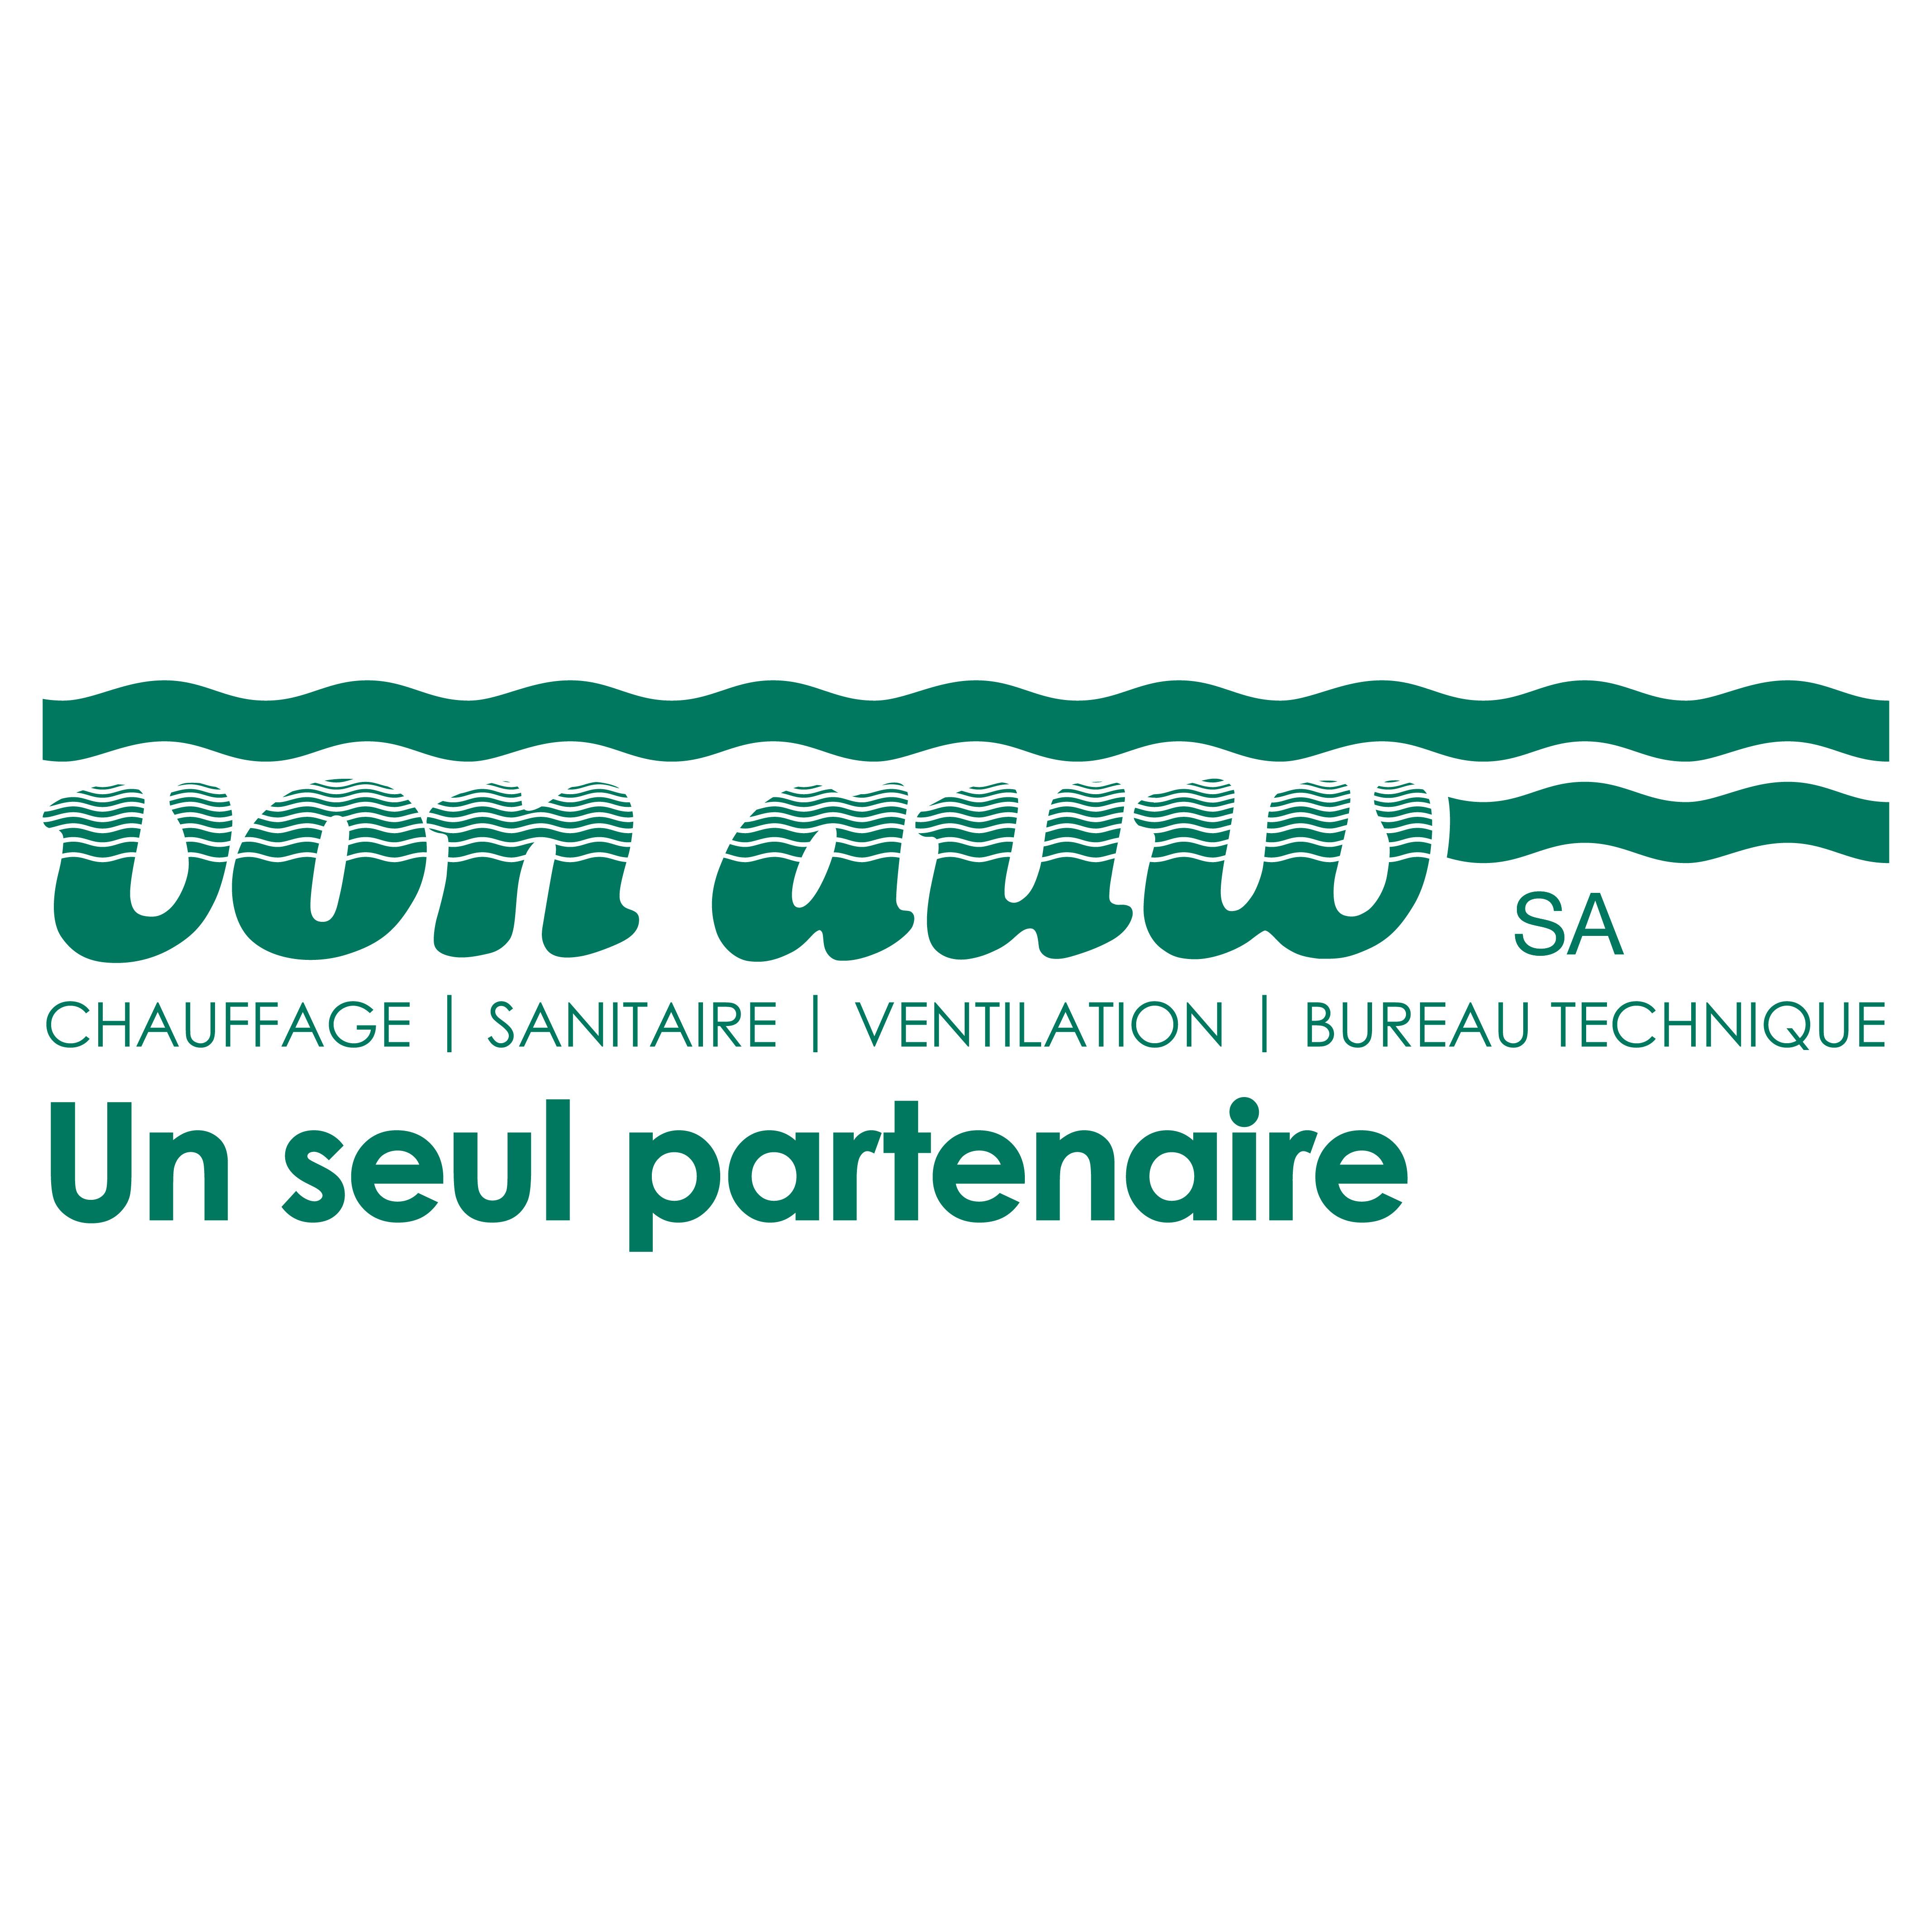 logo_aubonne_sitedivinum-01-1024x1024-01